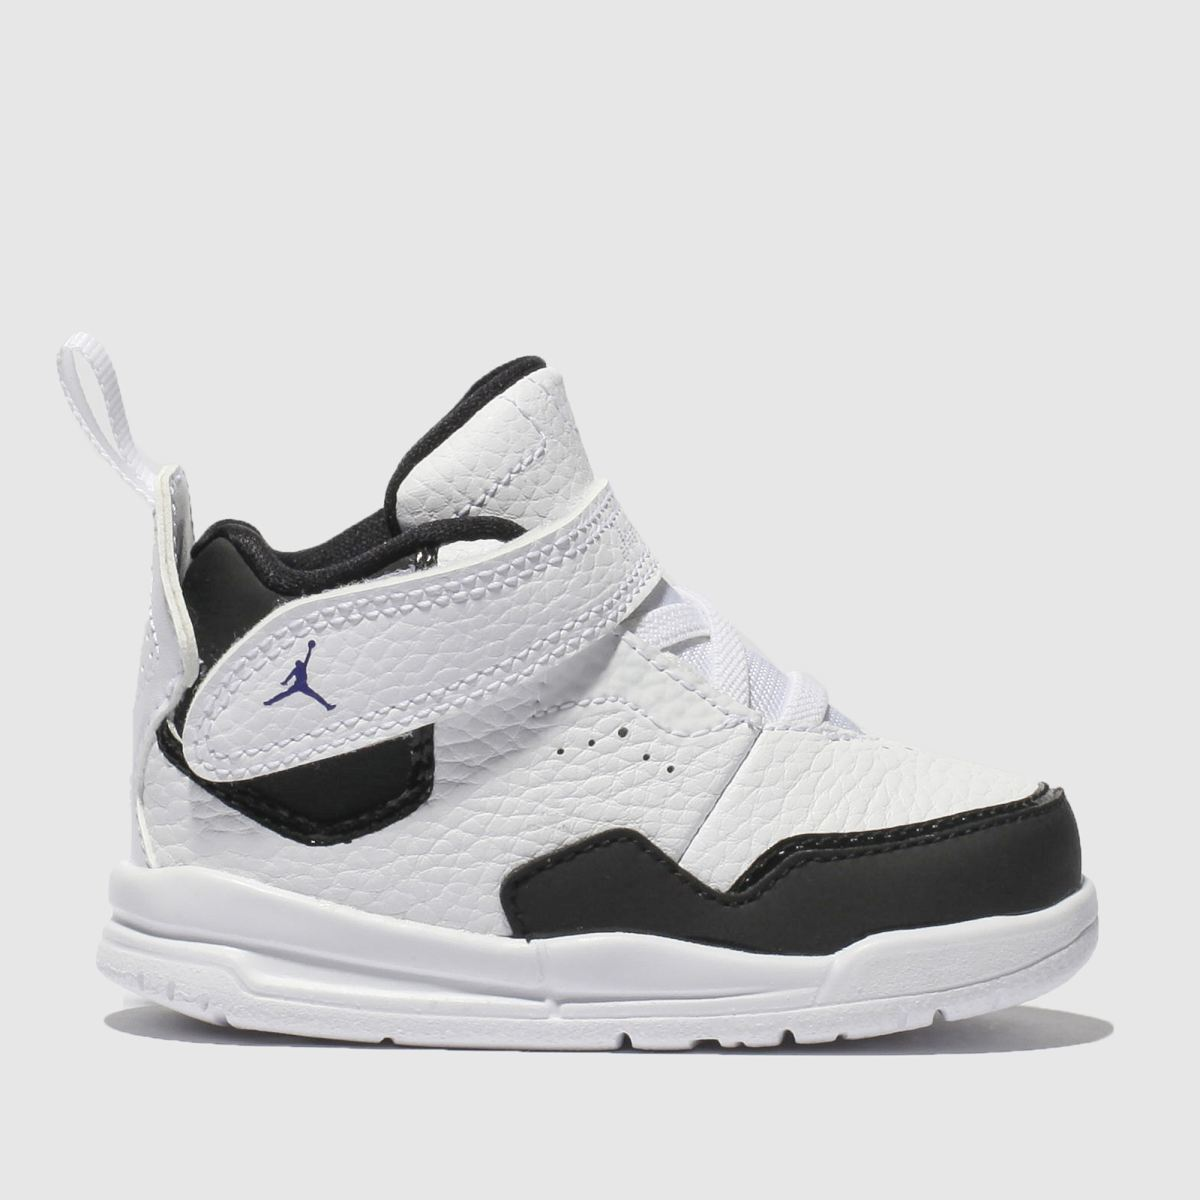 Nike Jordan White & Black Courtside 23 Trainers Toddler